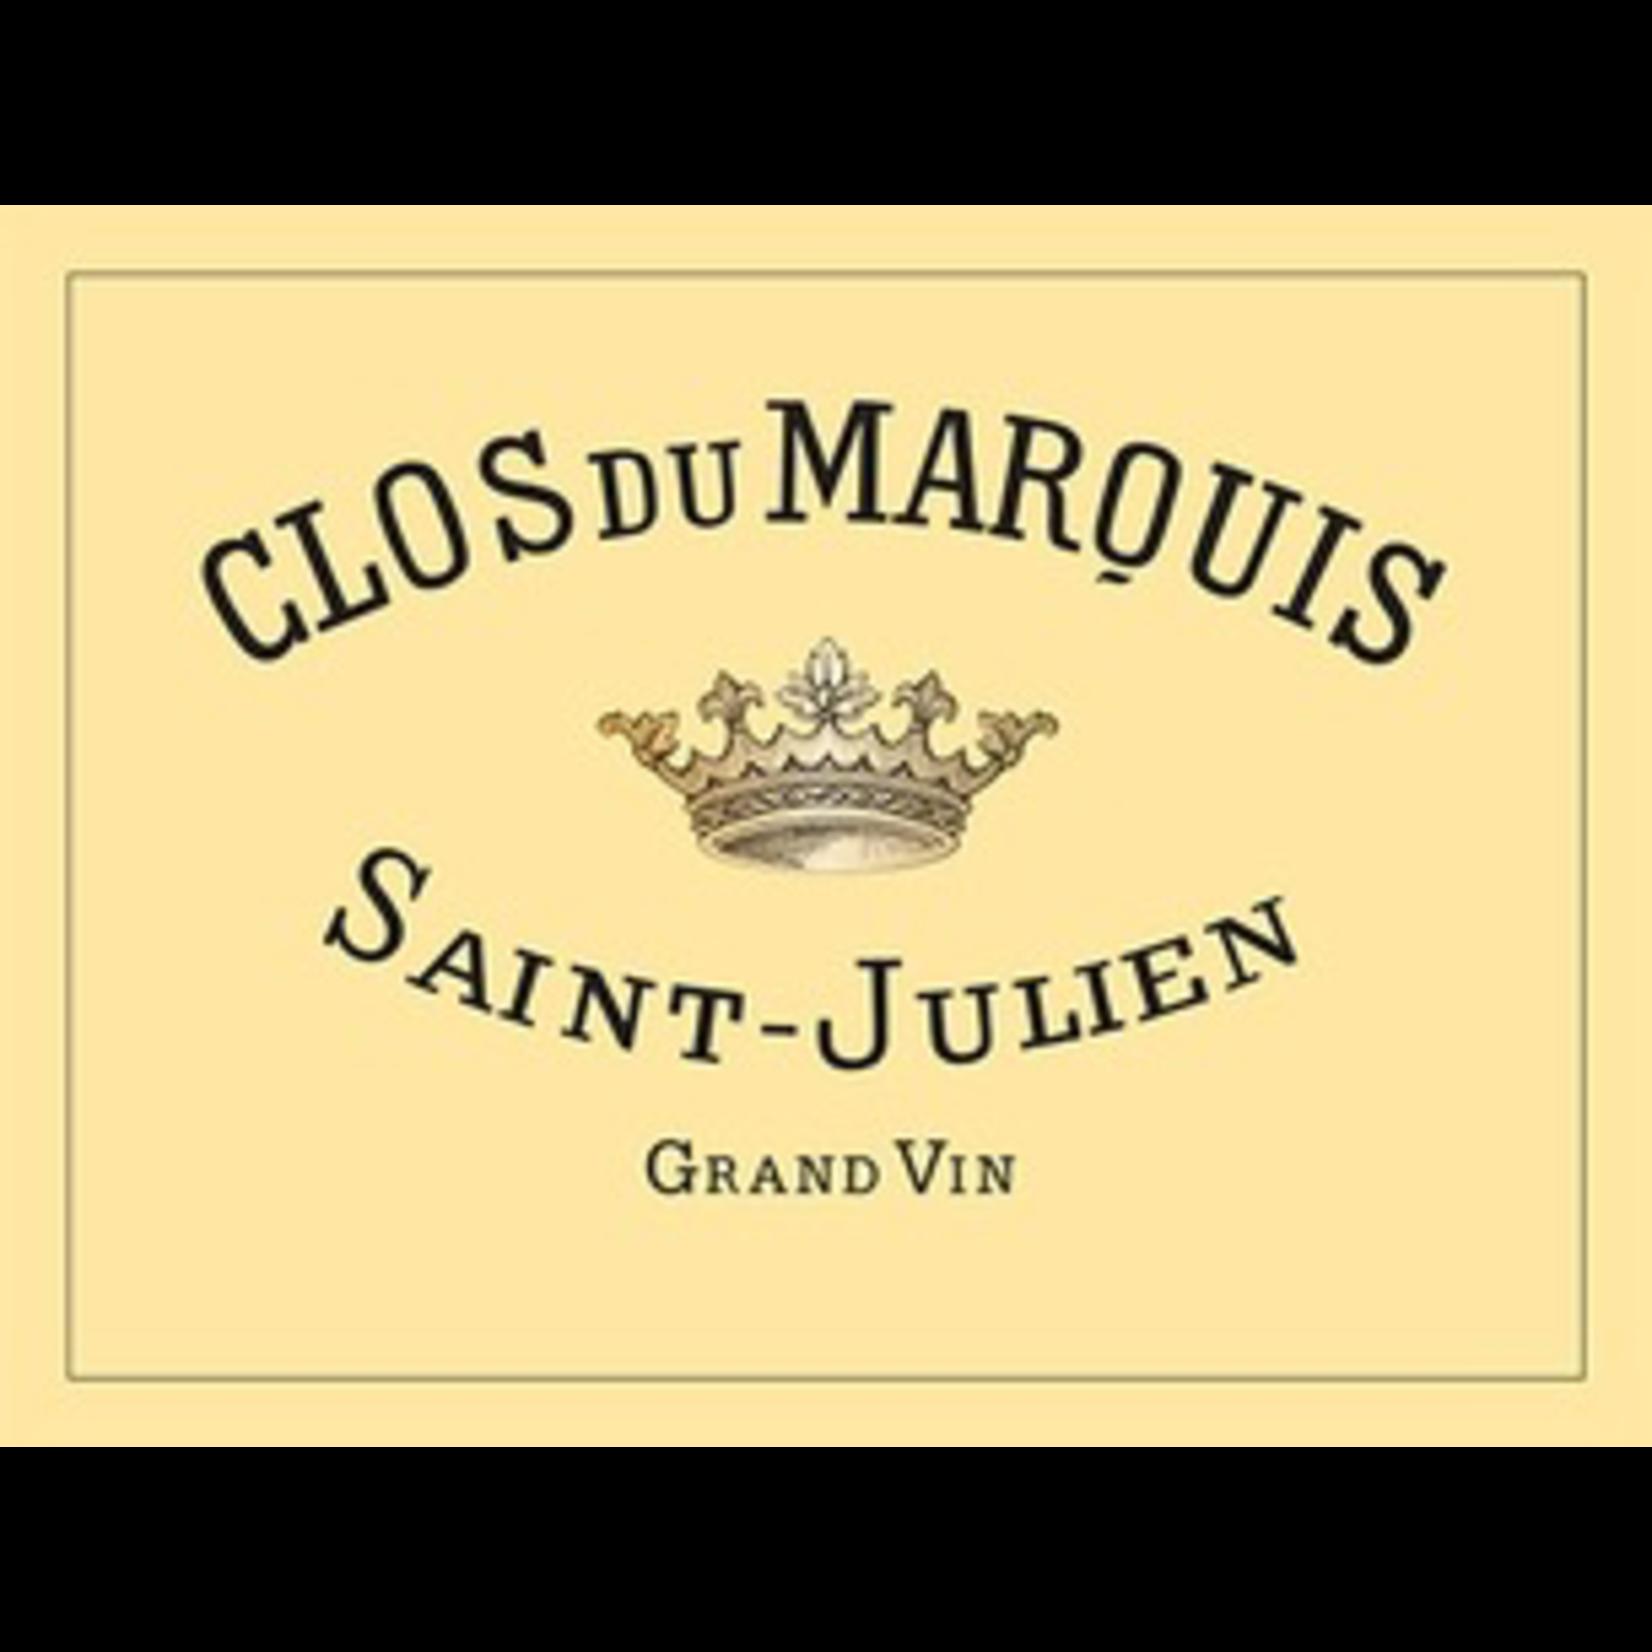 Wine Clos du Marquis 2018